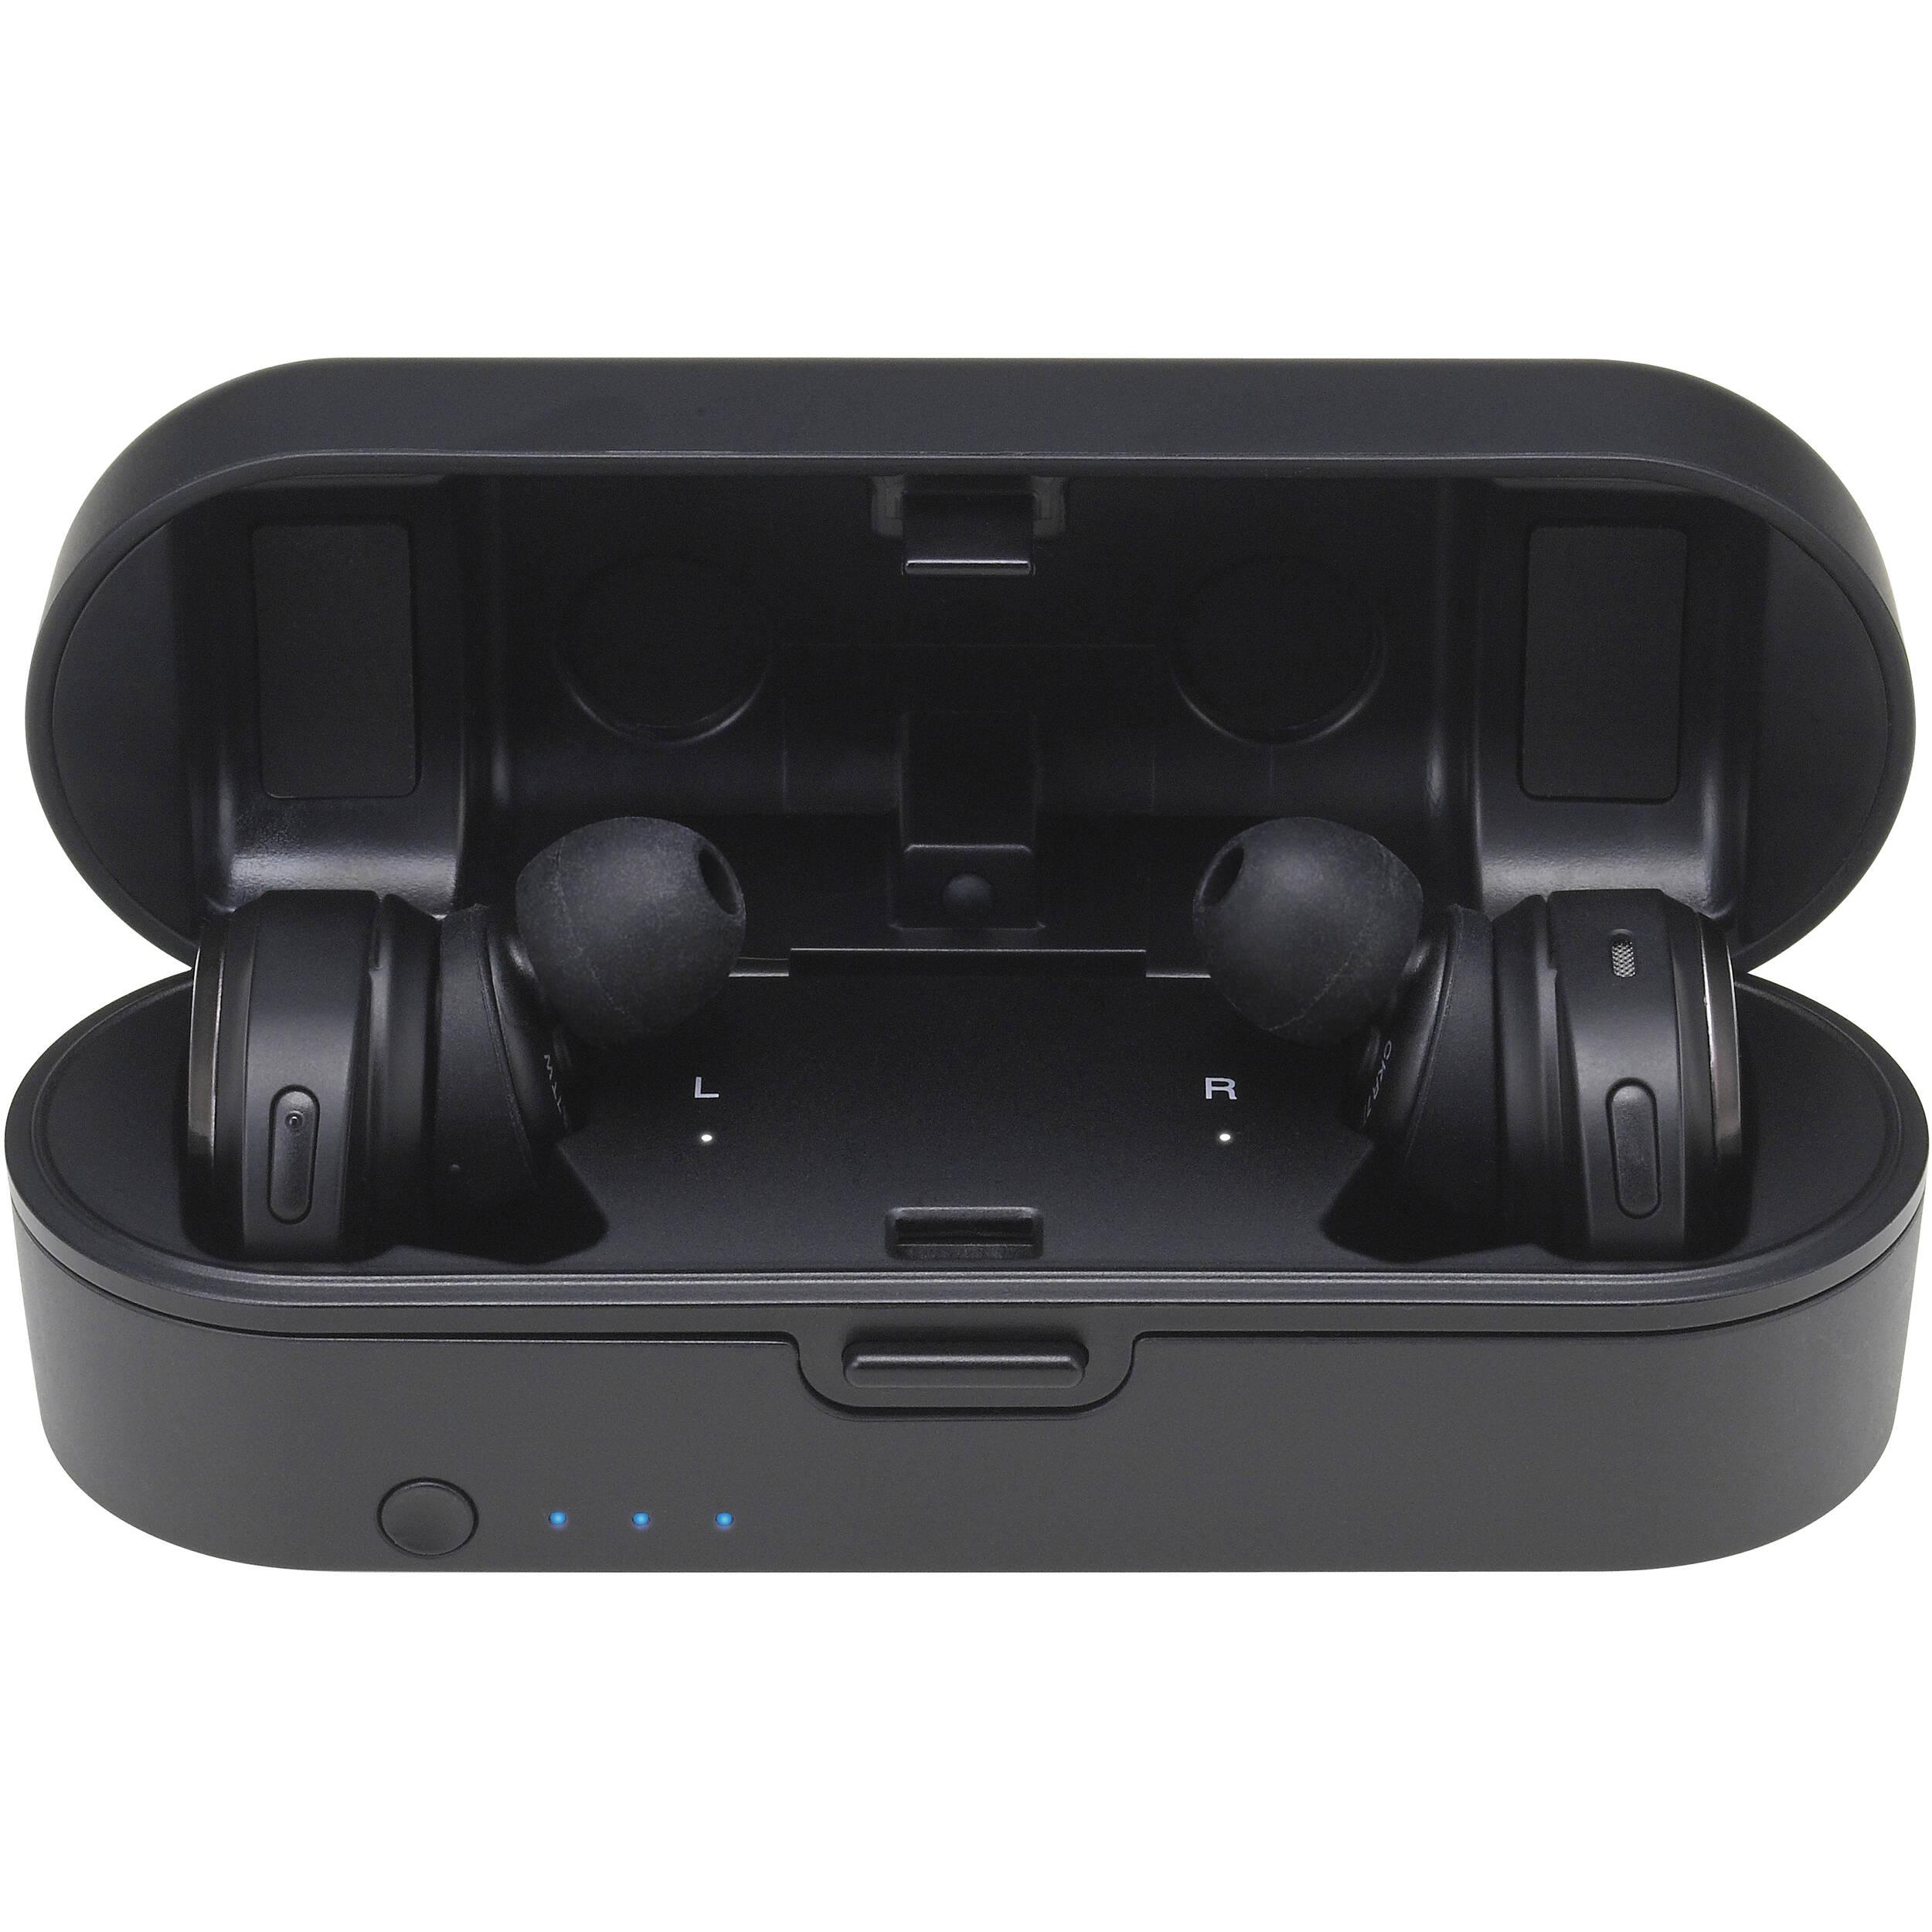 Análisis Auriculares Audio-Technica ATH-CKR7TW True Wireless